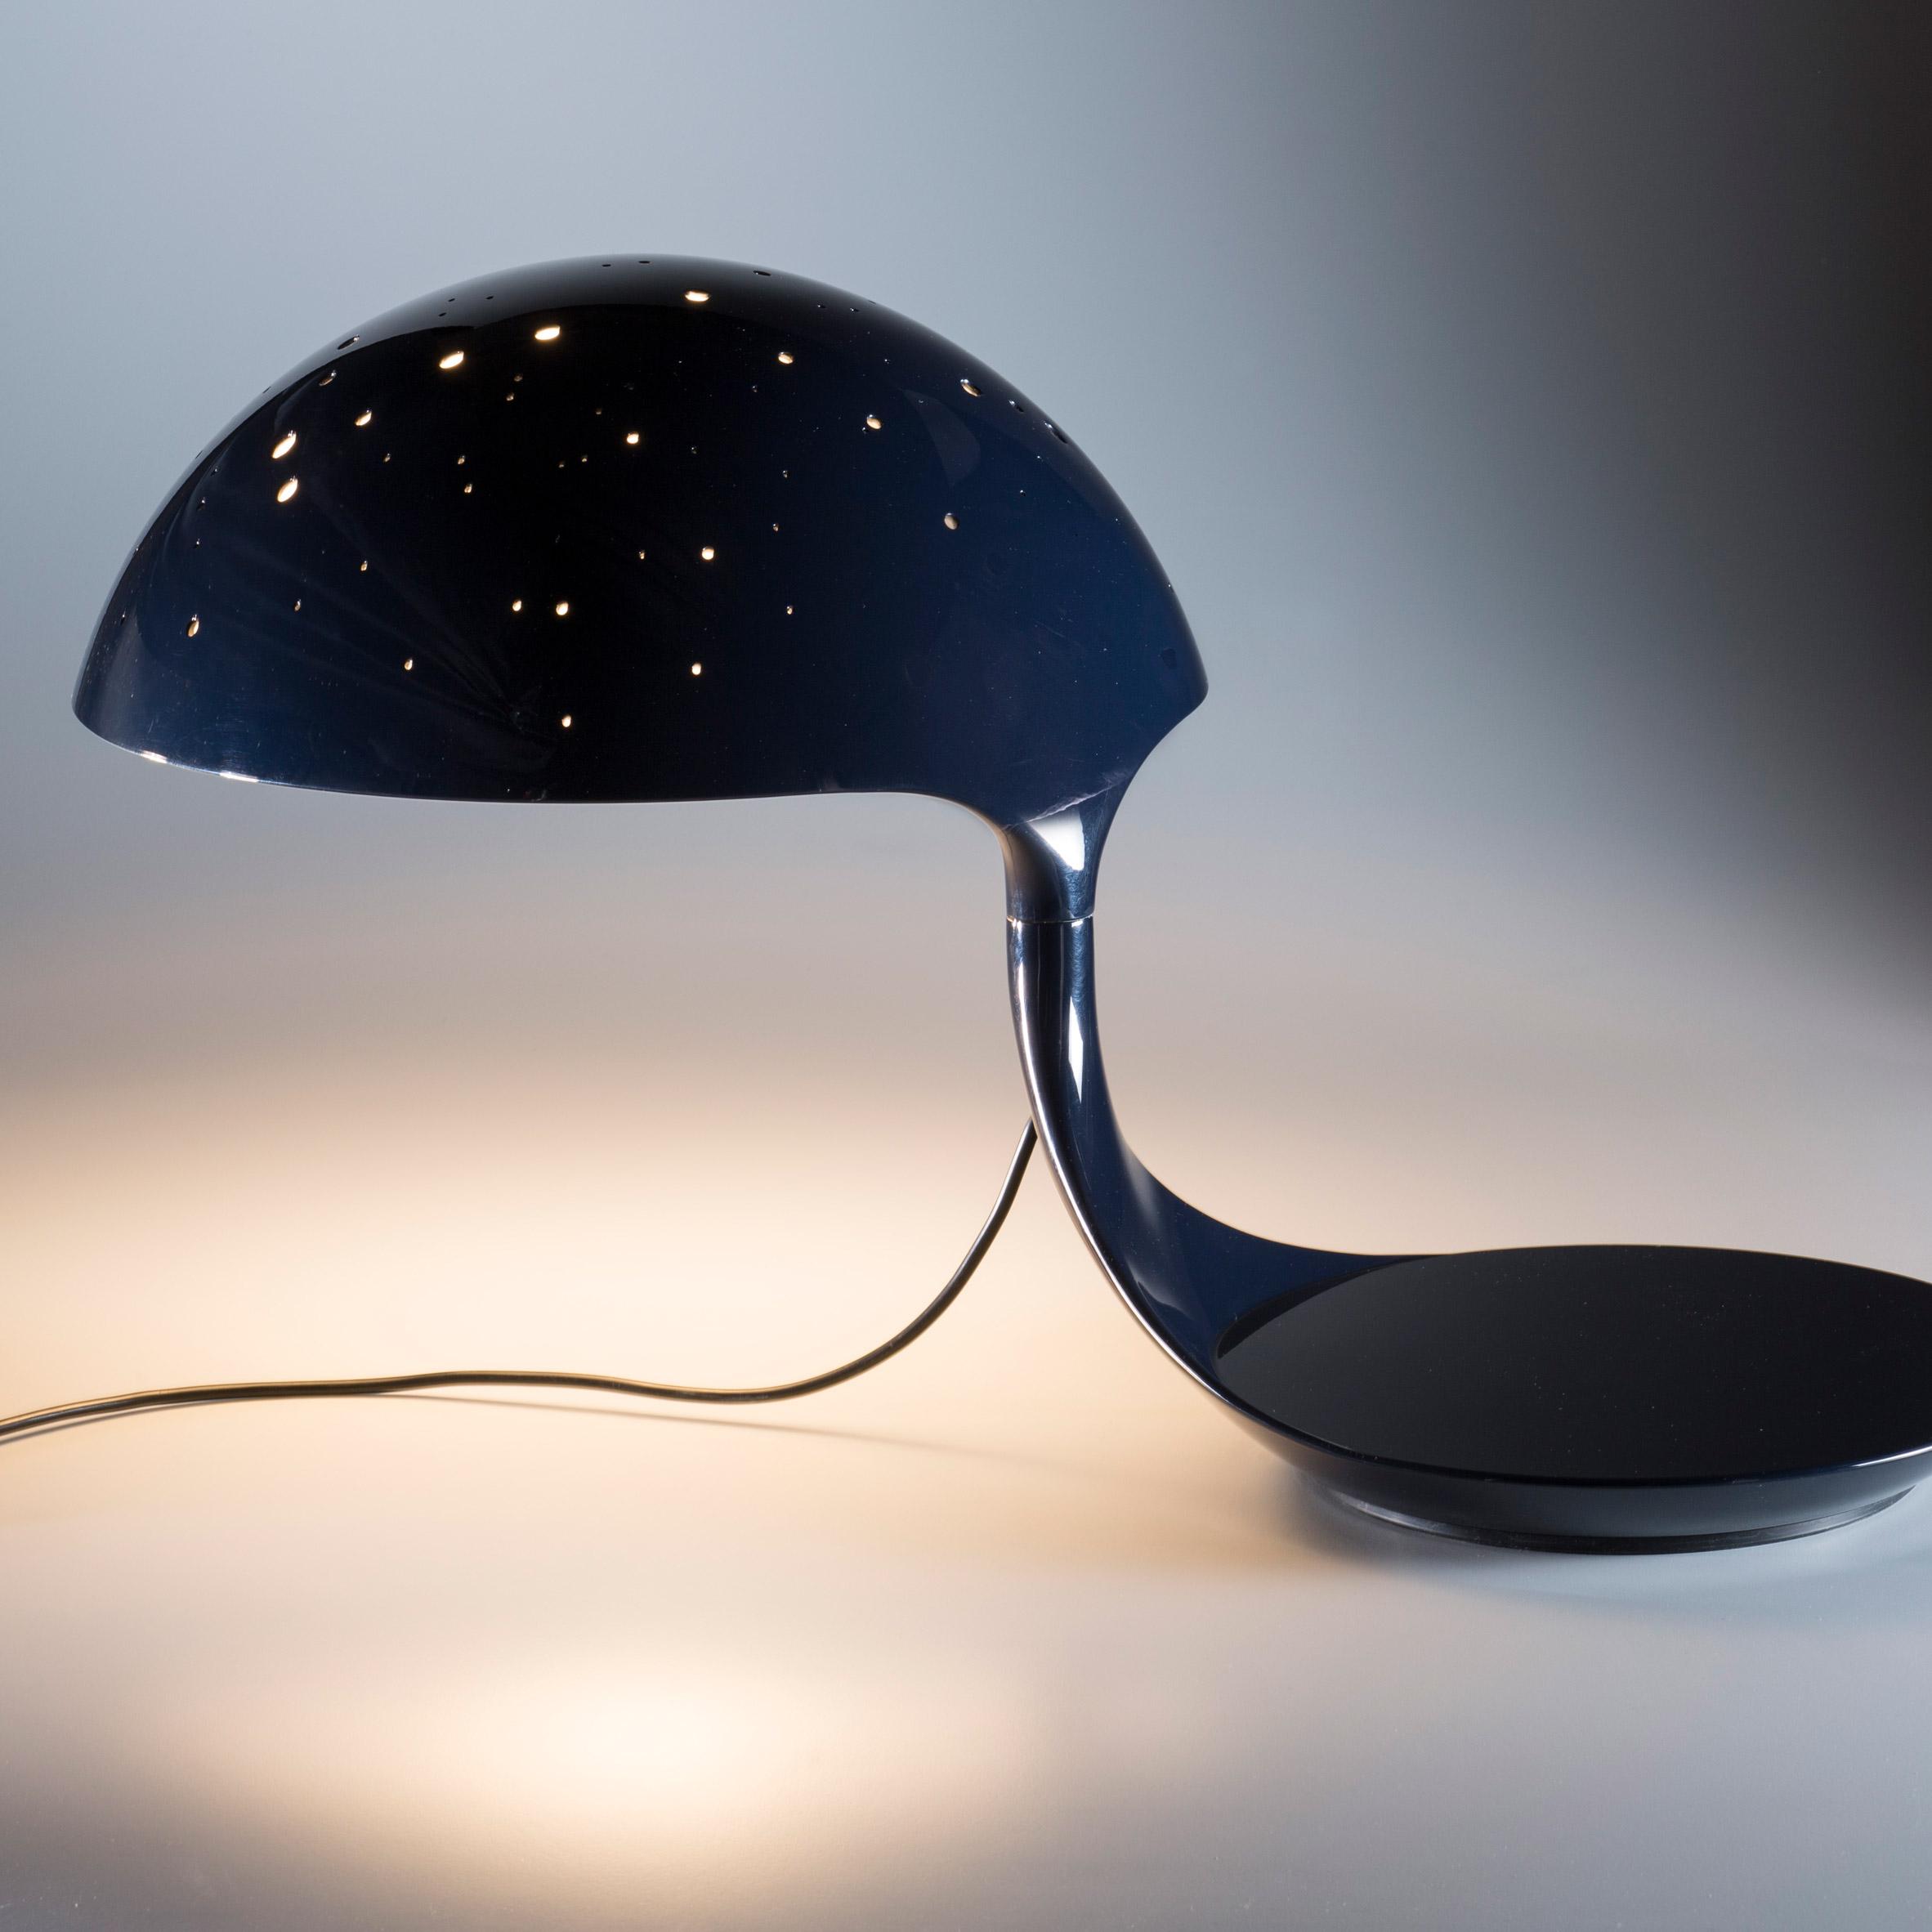 Cobra Scorpius light by Martinelli Luce